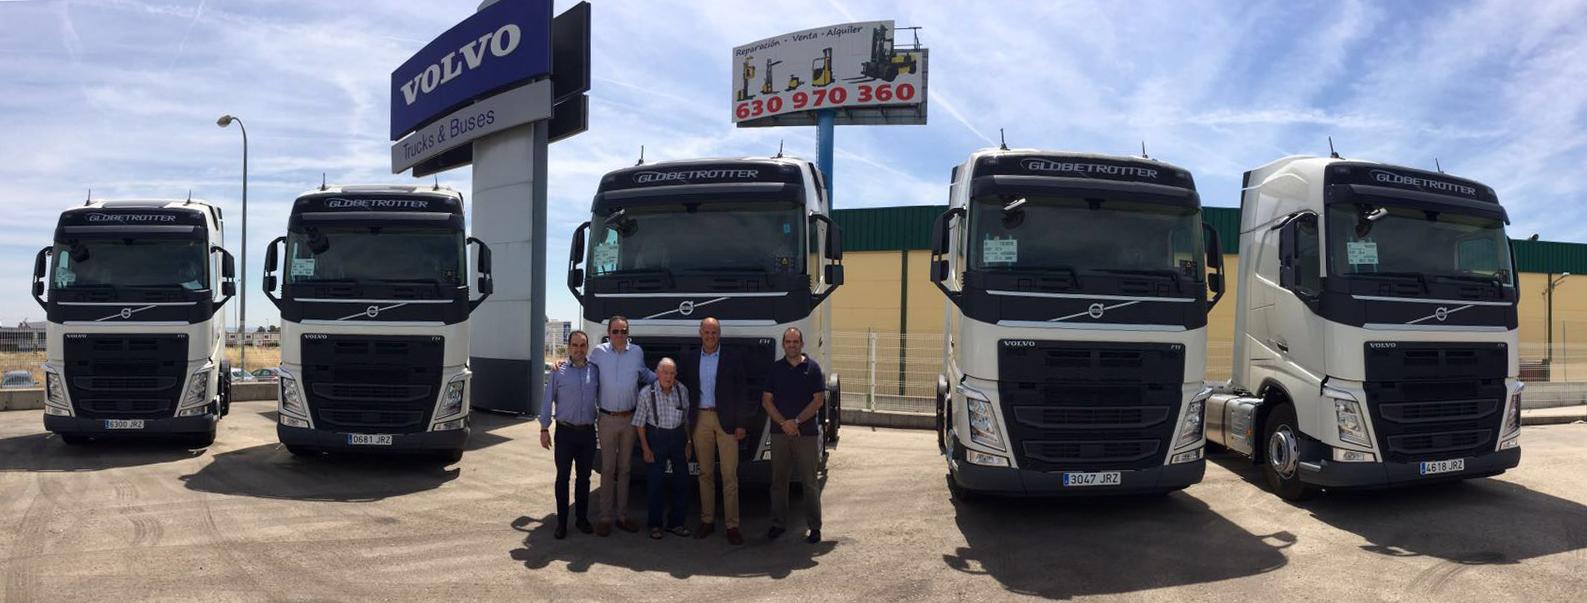 Avitrans Megacamiones Volvo